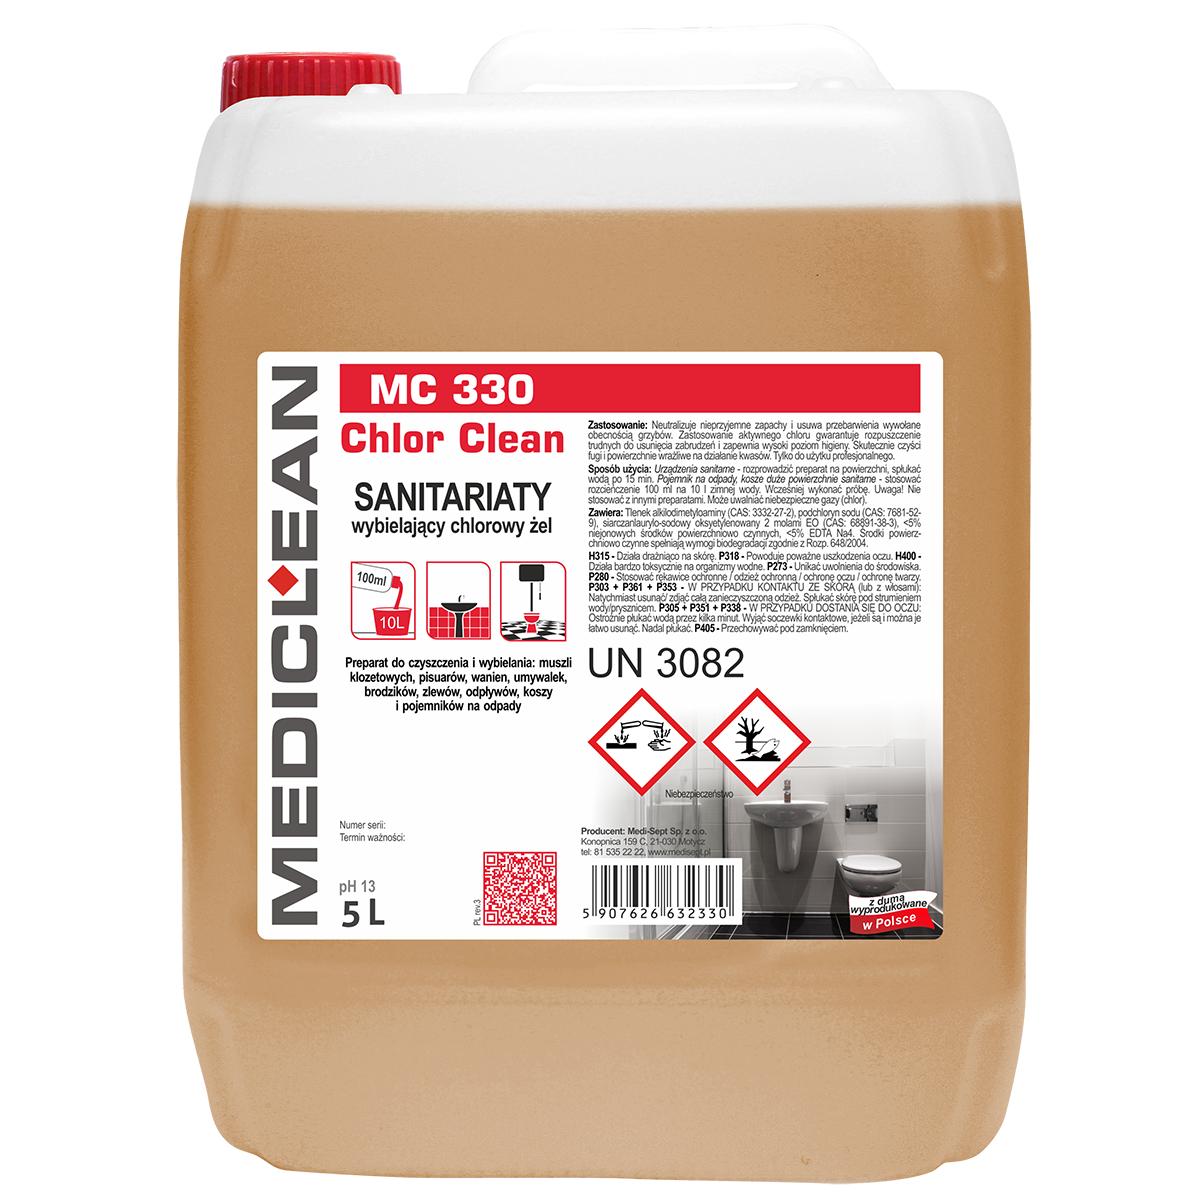 Mediclean Chlor Clean Wybielający żel Do łazienek I Wc 5l